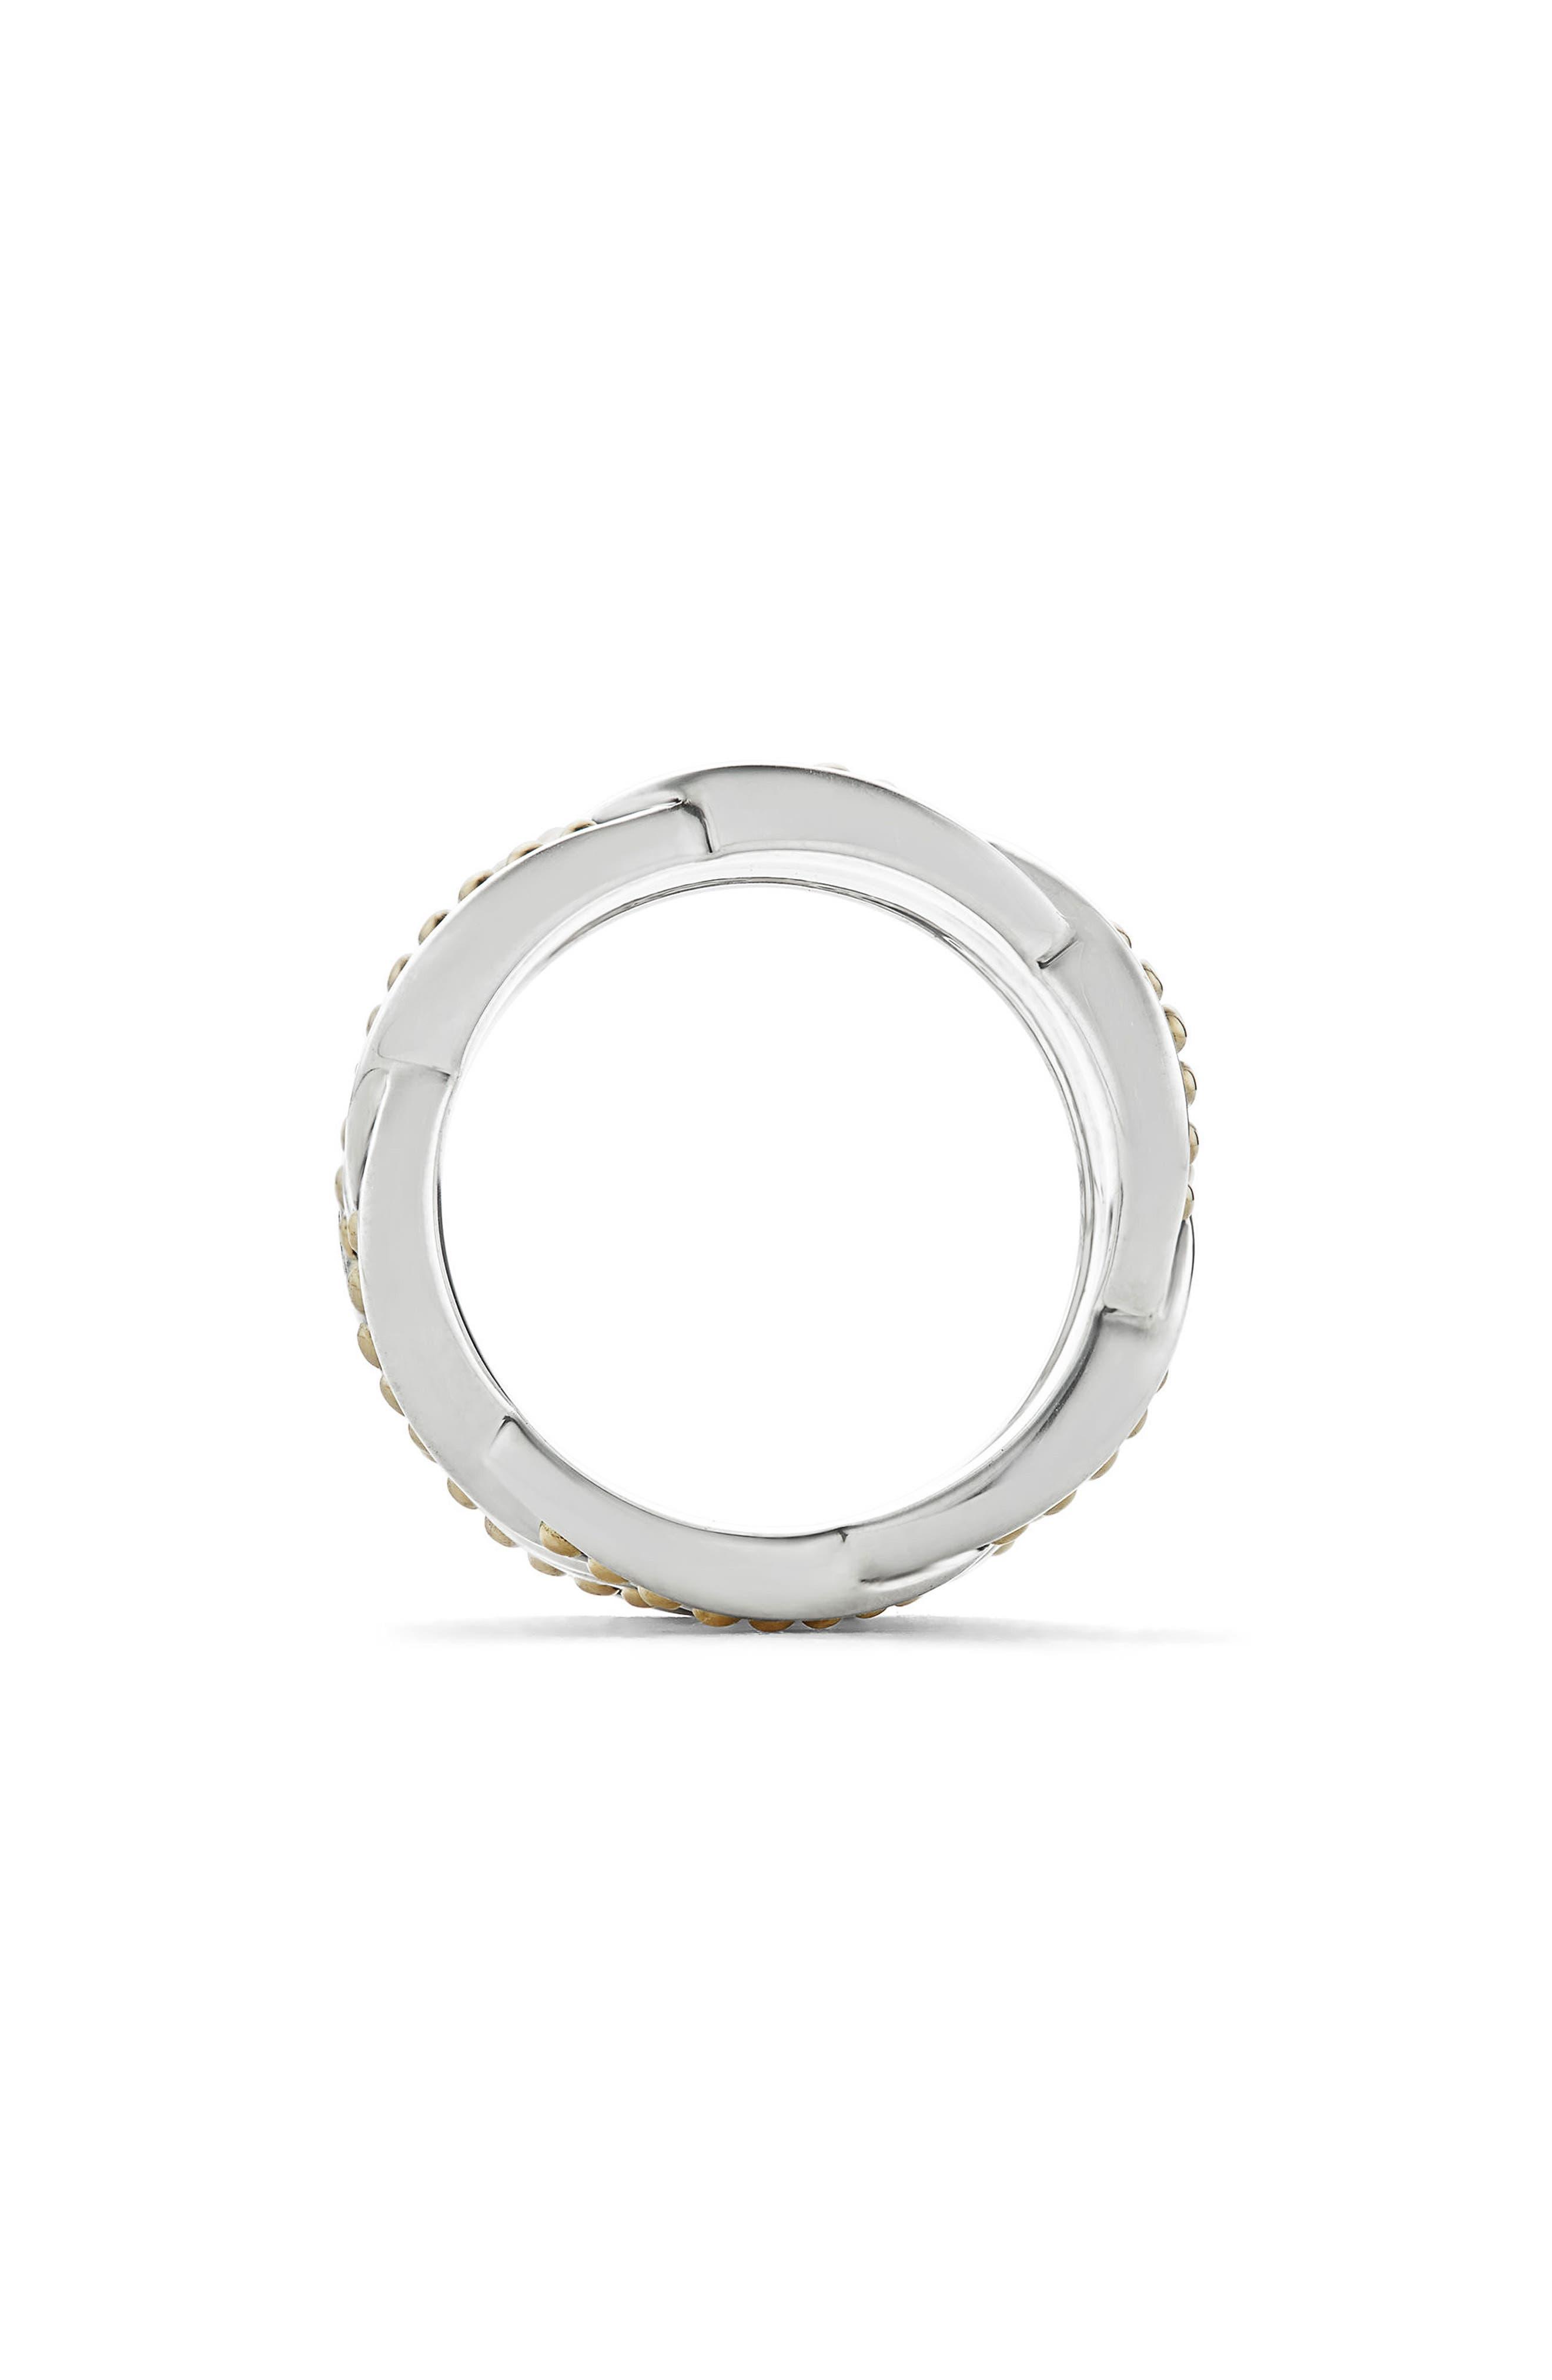 Torsade Knot Ring,                             Alternate thumbnail 4, color,                             Silver/ Gold